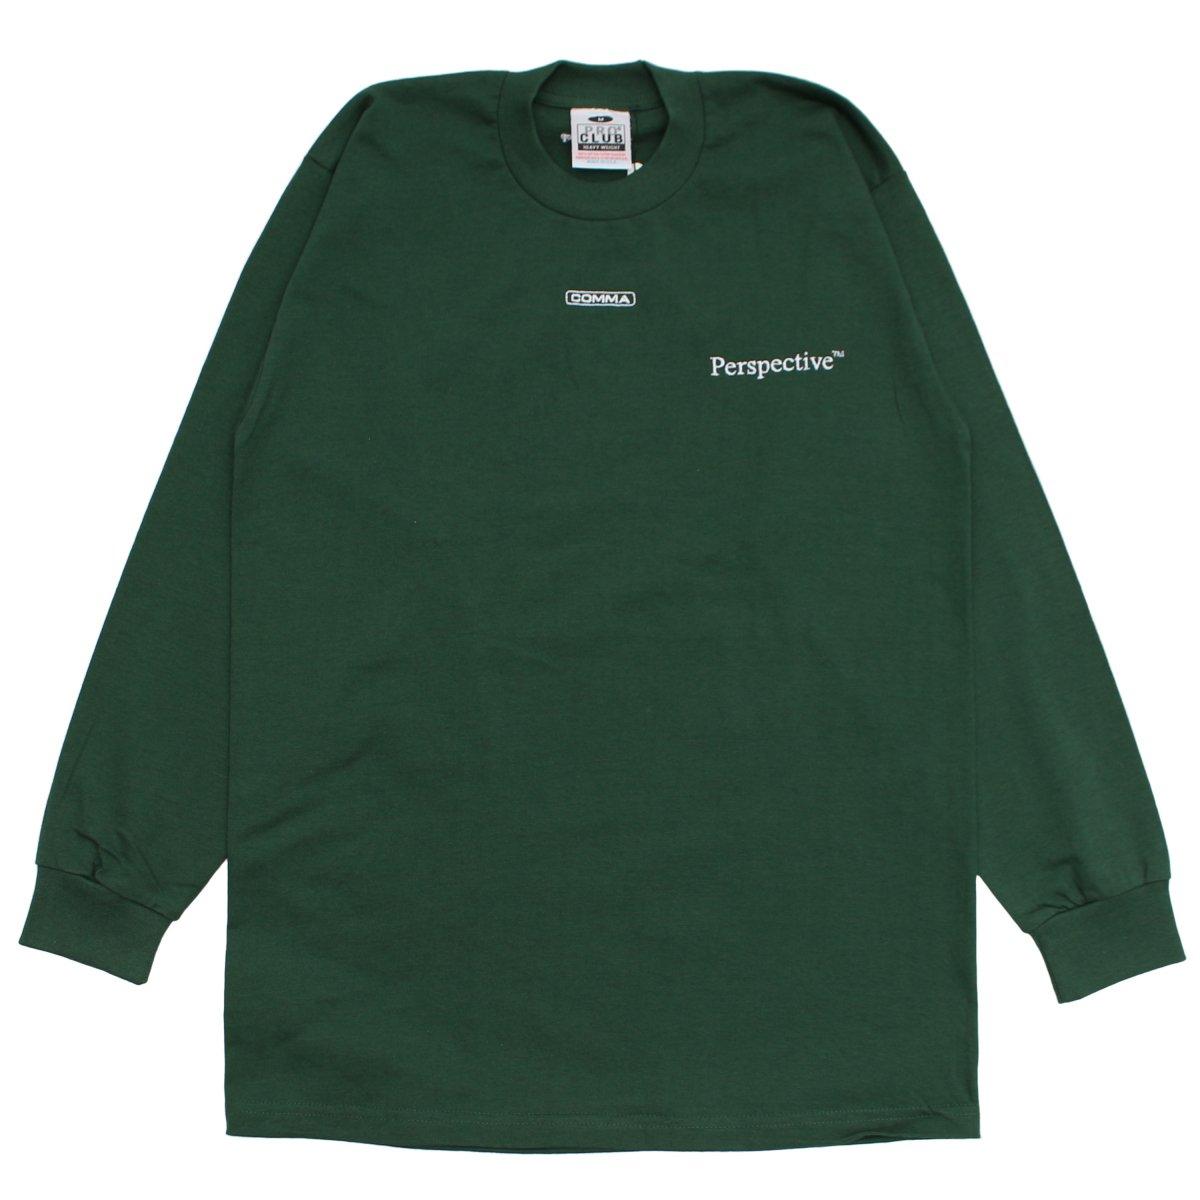 Perspective™ Green Long Sleeve Tee